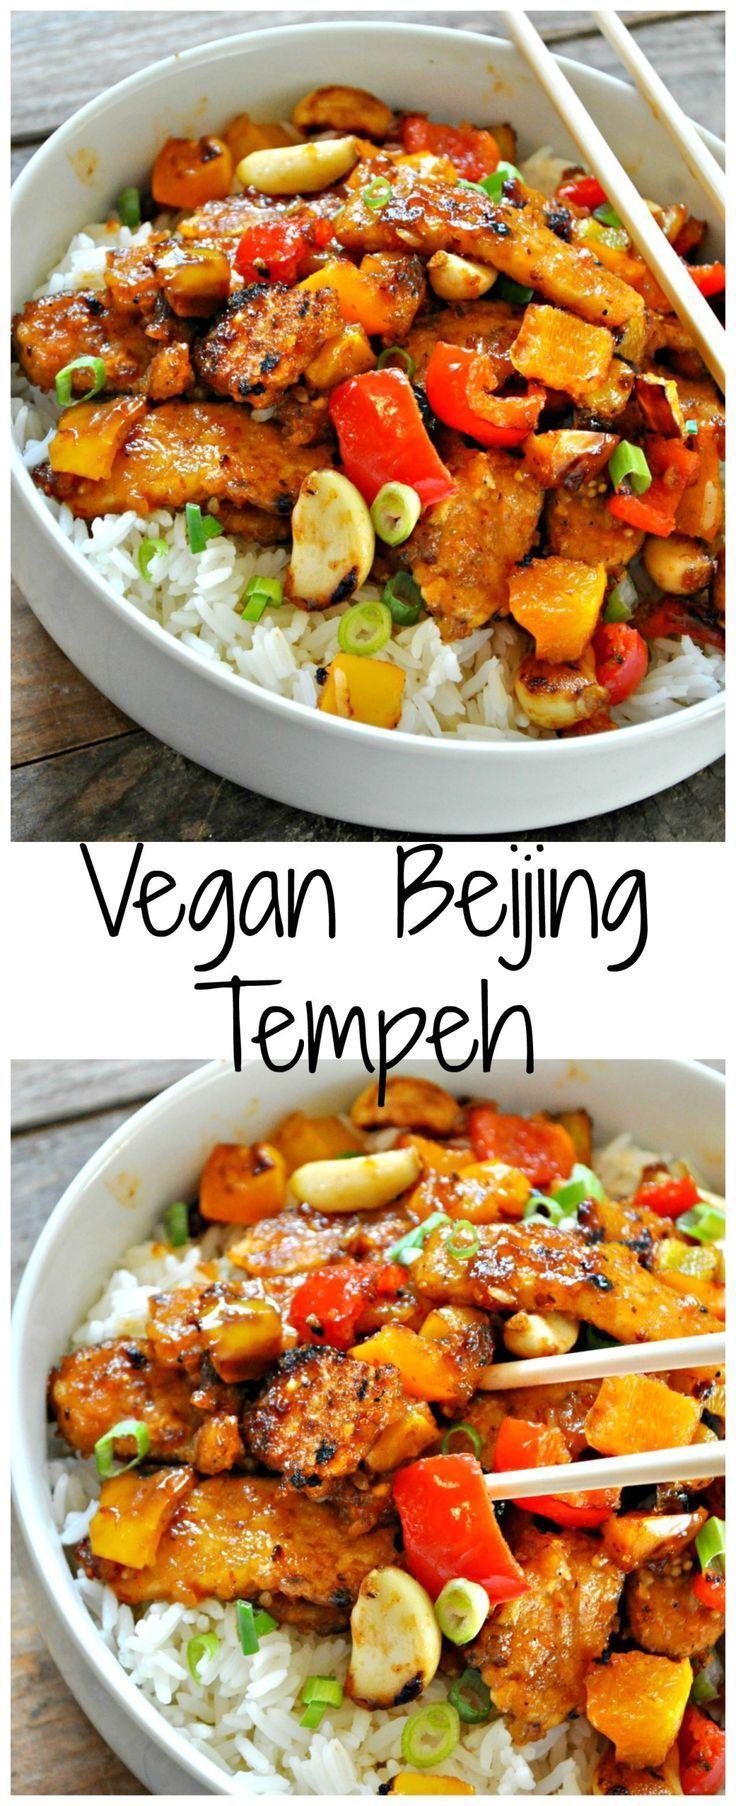 Vegan Beijing Tempeh